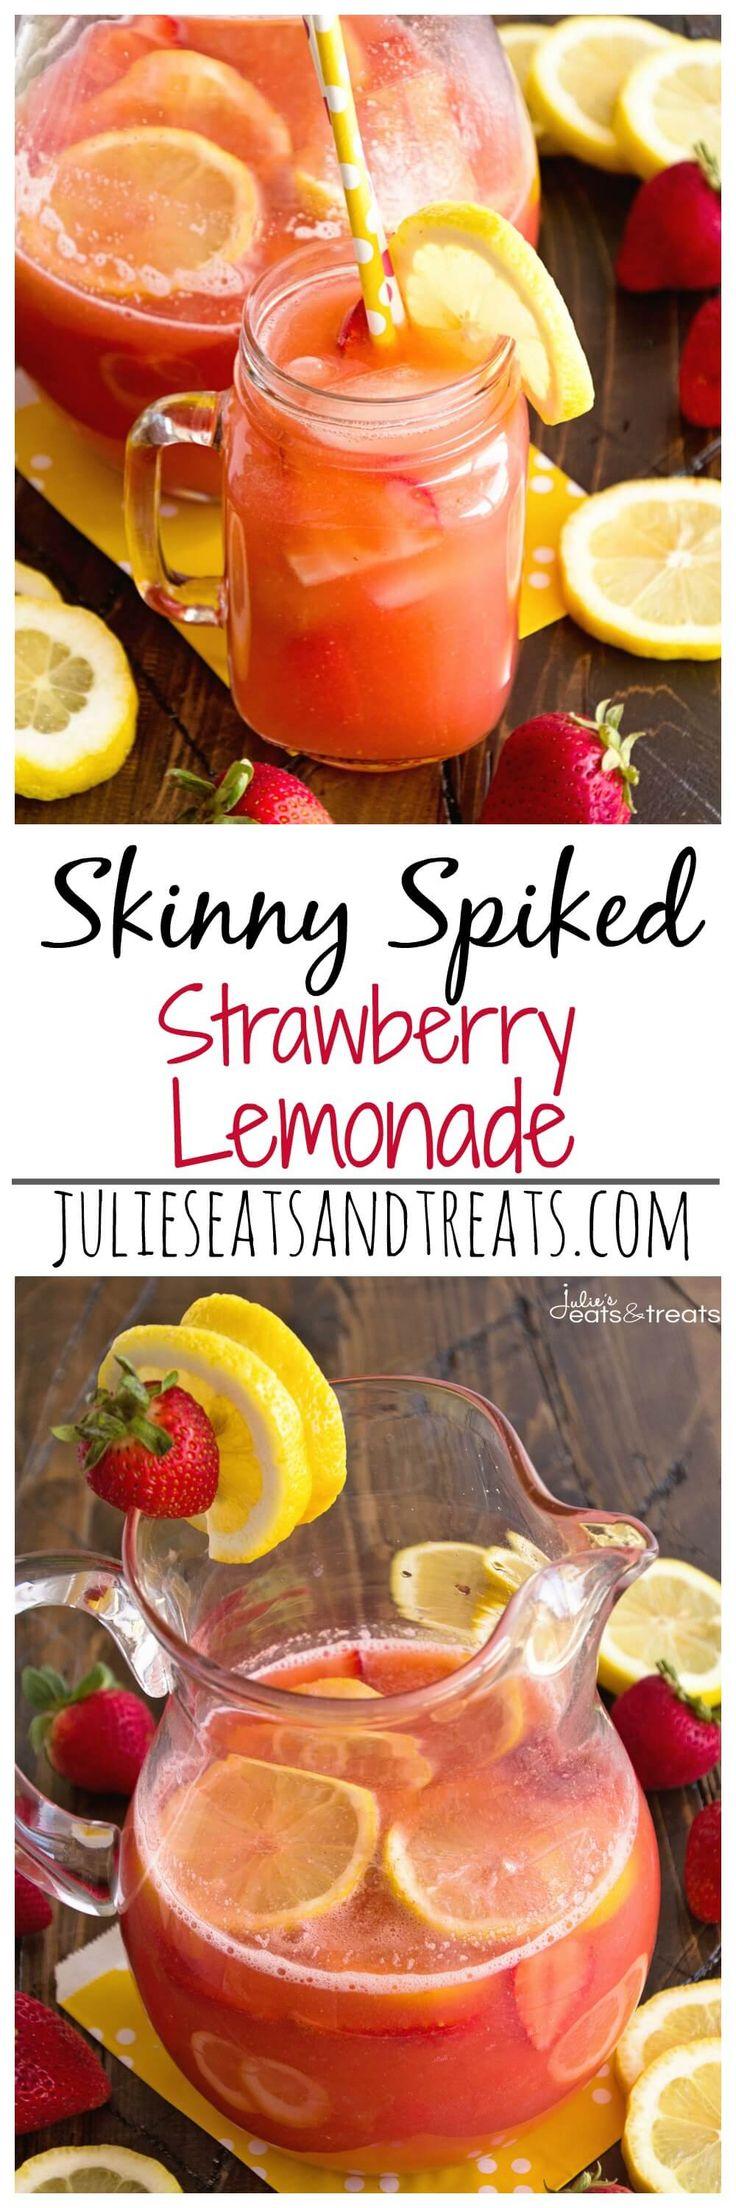 Skinny Spiked Strawberry Lemonade ~ Delicious Strawberry Lemonade Recipe Sweetened with Truvia and Spiked with Strawberry Lemonade Vodka! ~ http://www.julieseatsandtreats.com